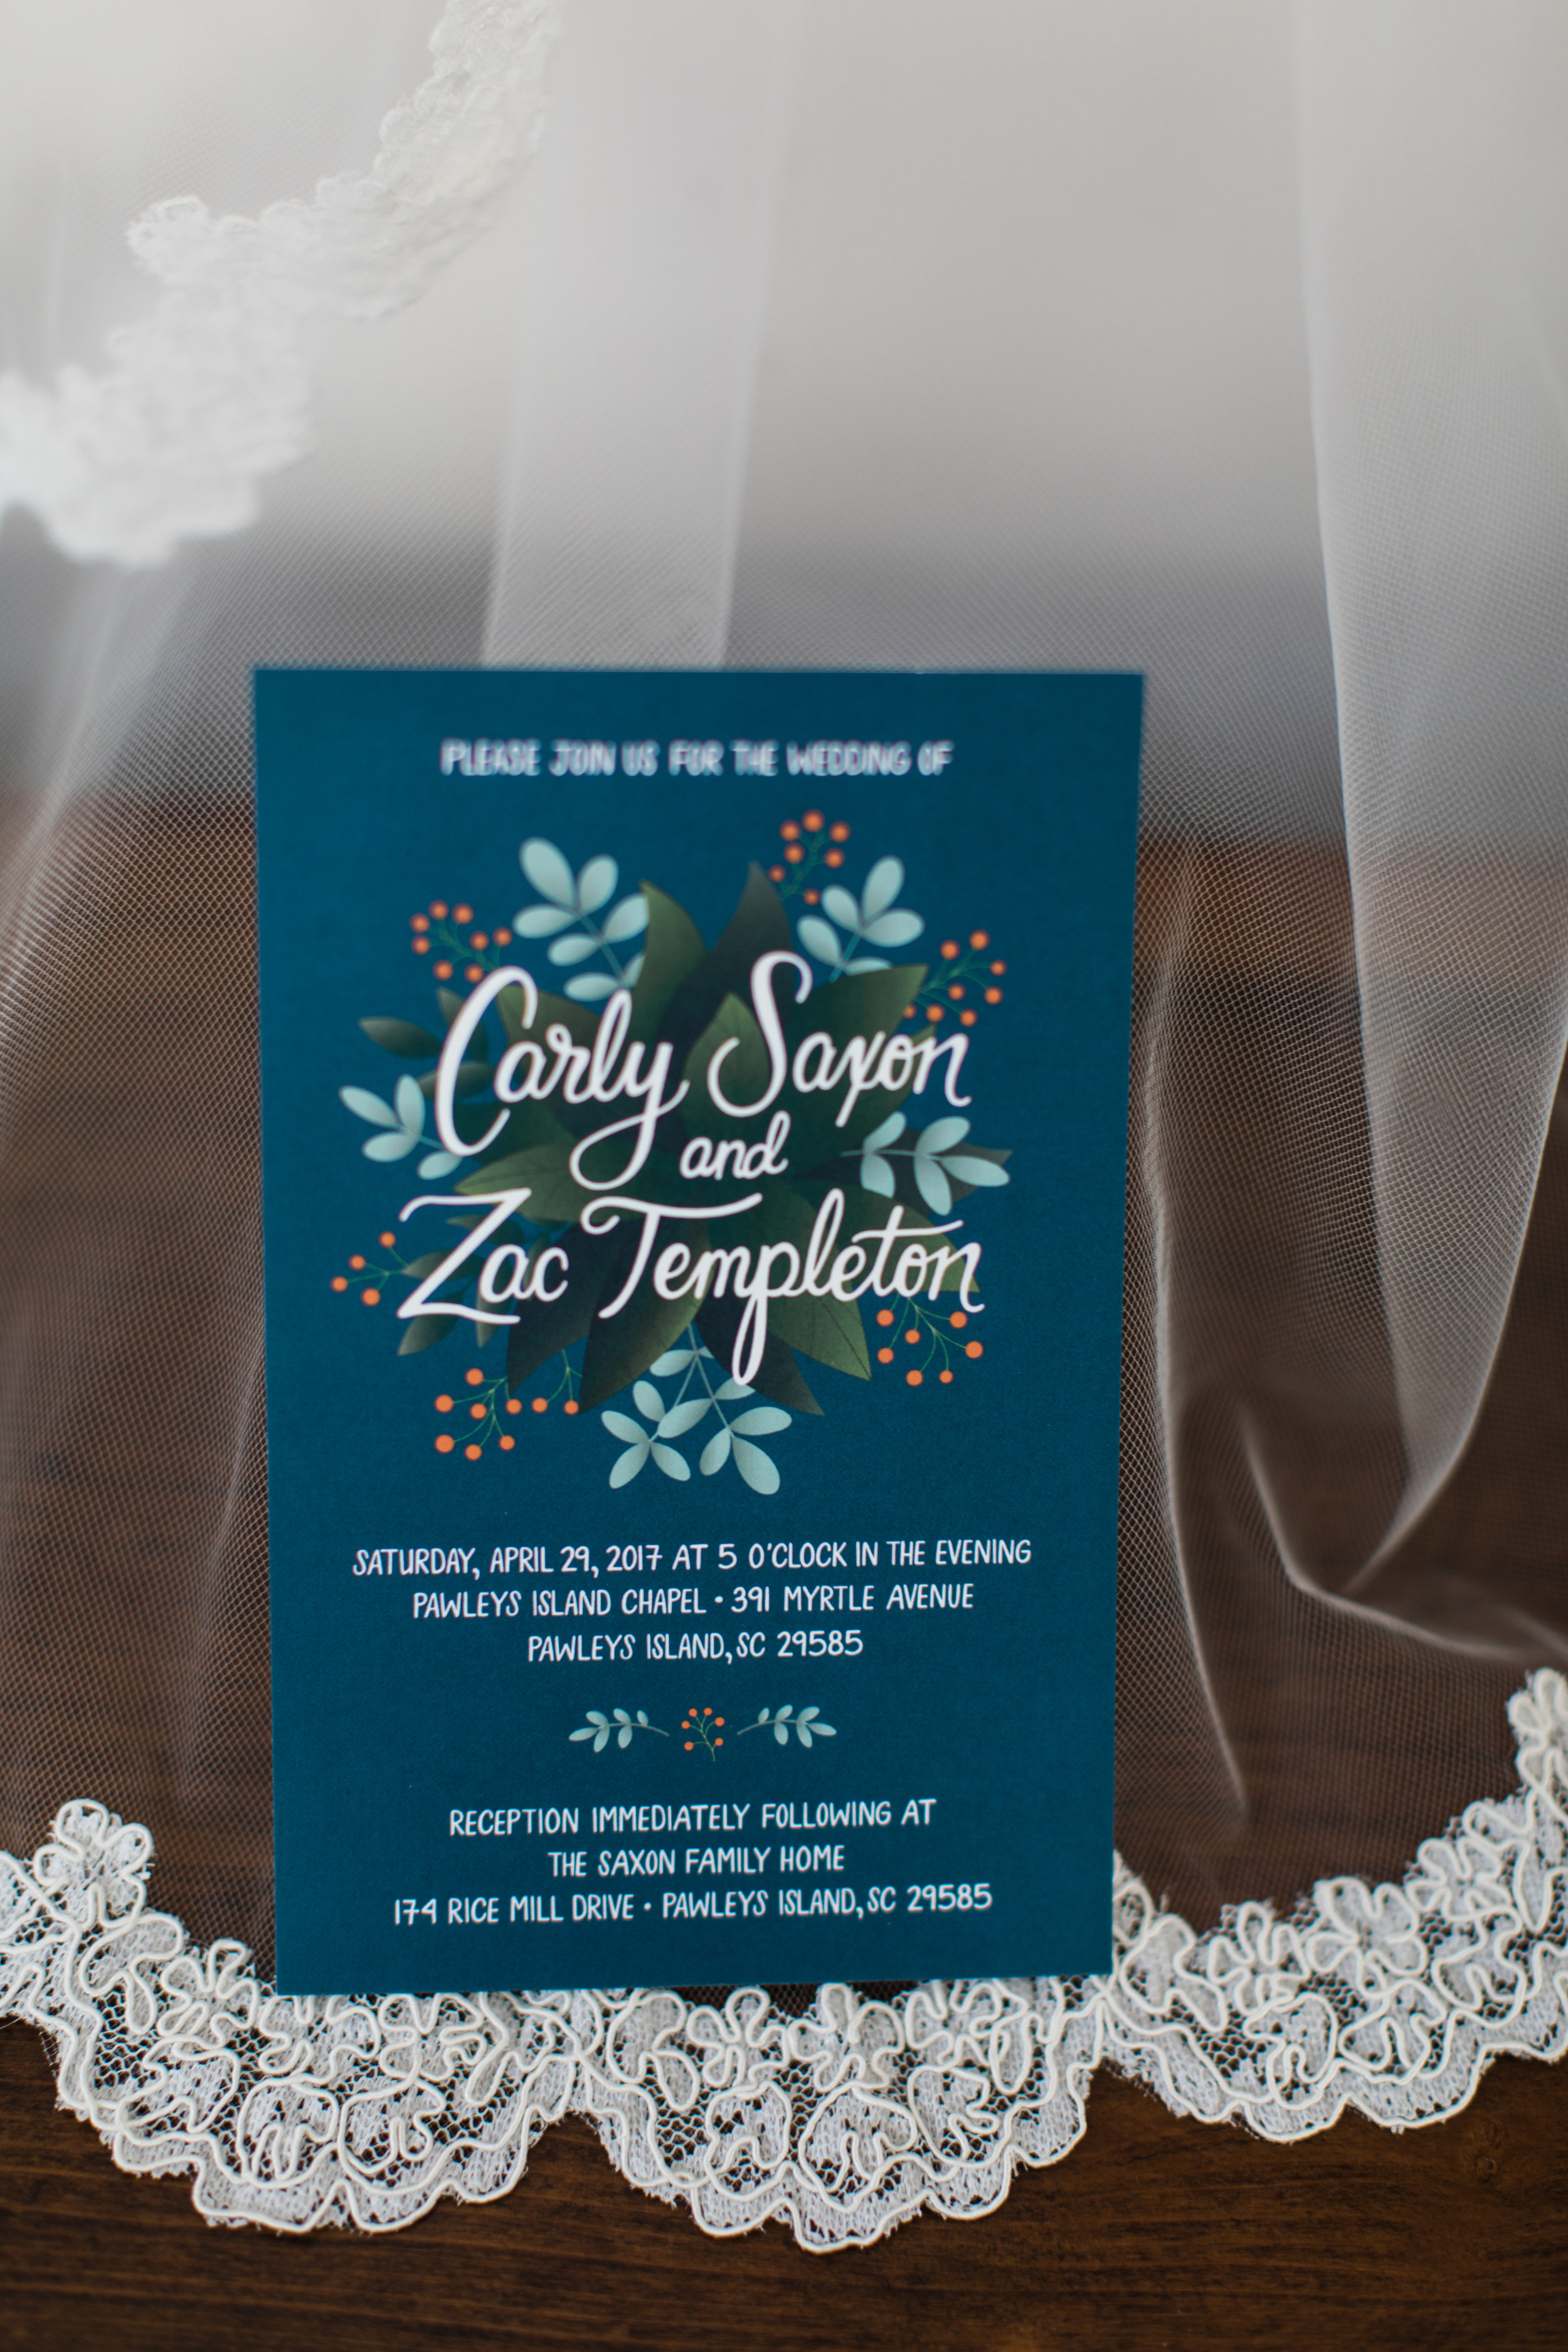 Carly-Zac-Wedding-007.jpg